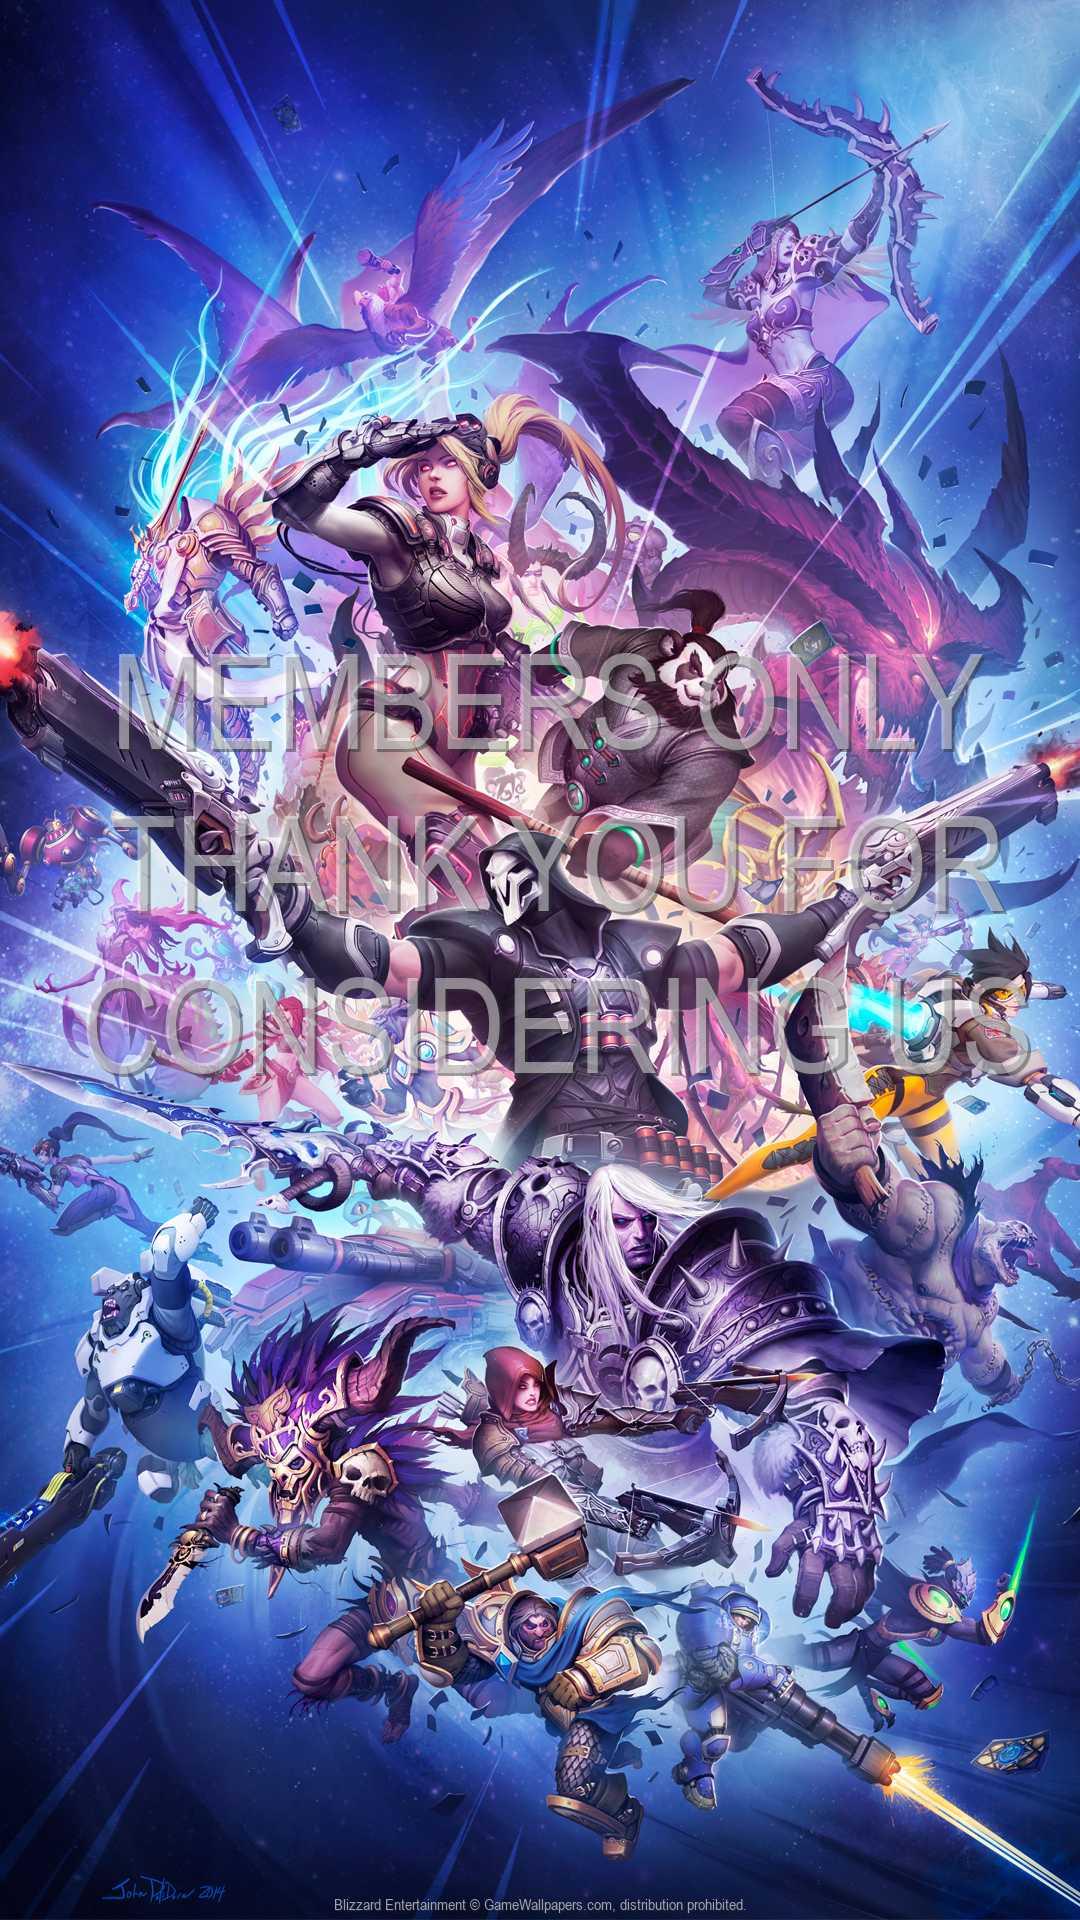 Blizzard Entertainment 1080p Vertical Mobile wallpaper or background 02